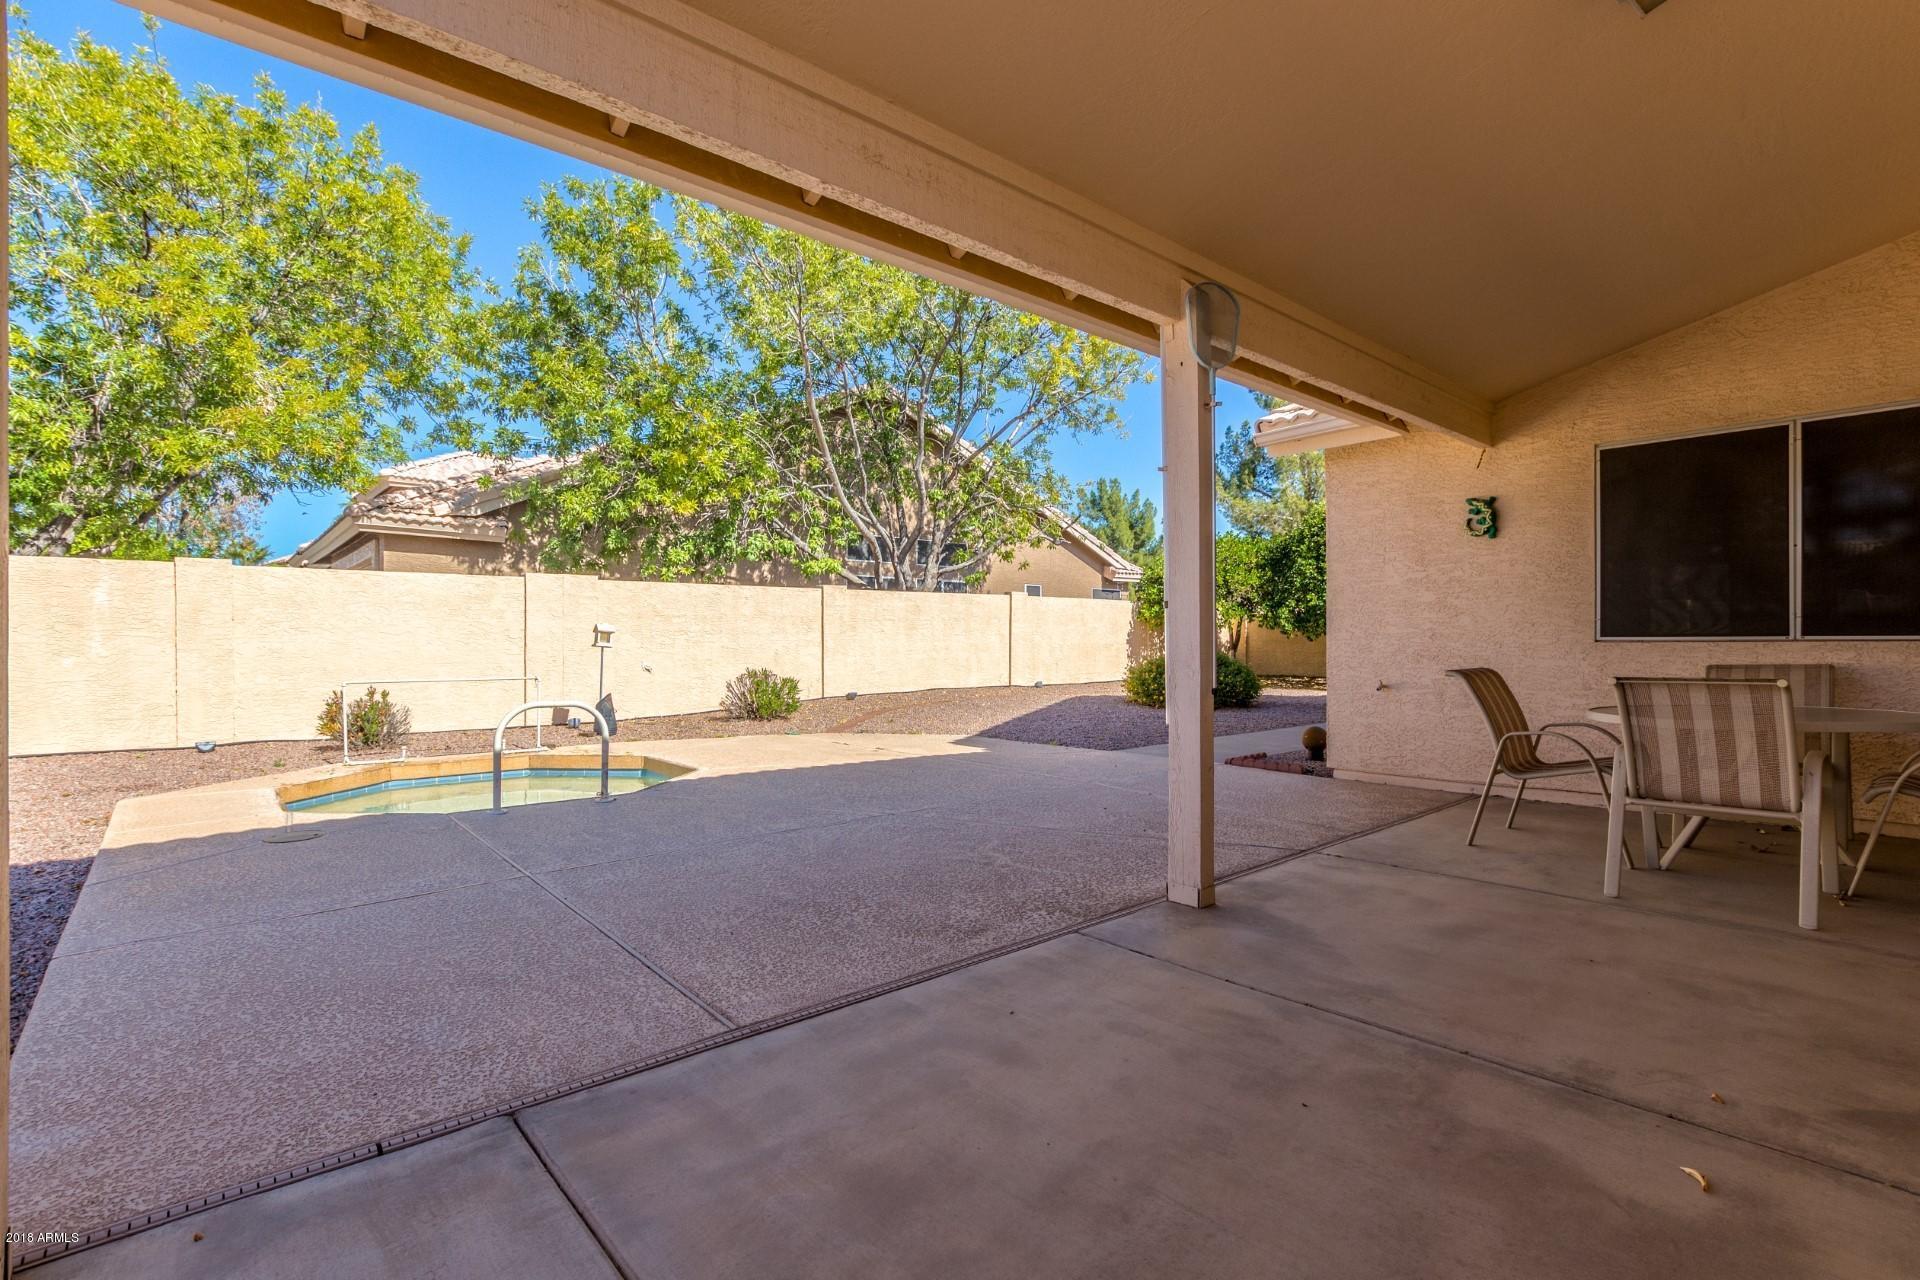 MLS 5847154 3772 W Linda Lane, Chandler, AZ 85226 Chandler AZ Cottonwood Ranch